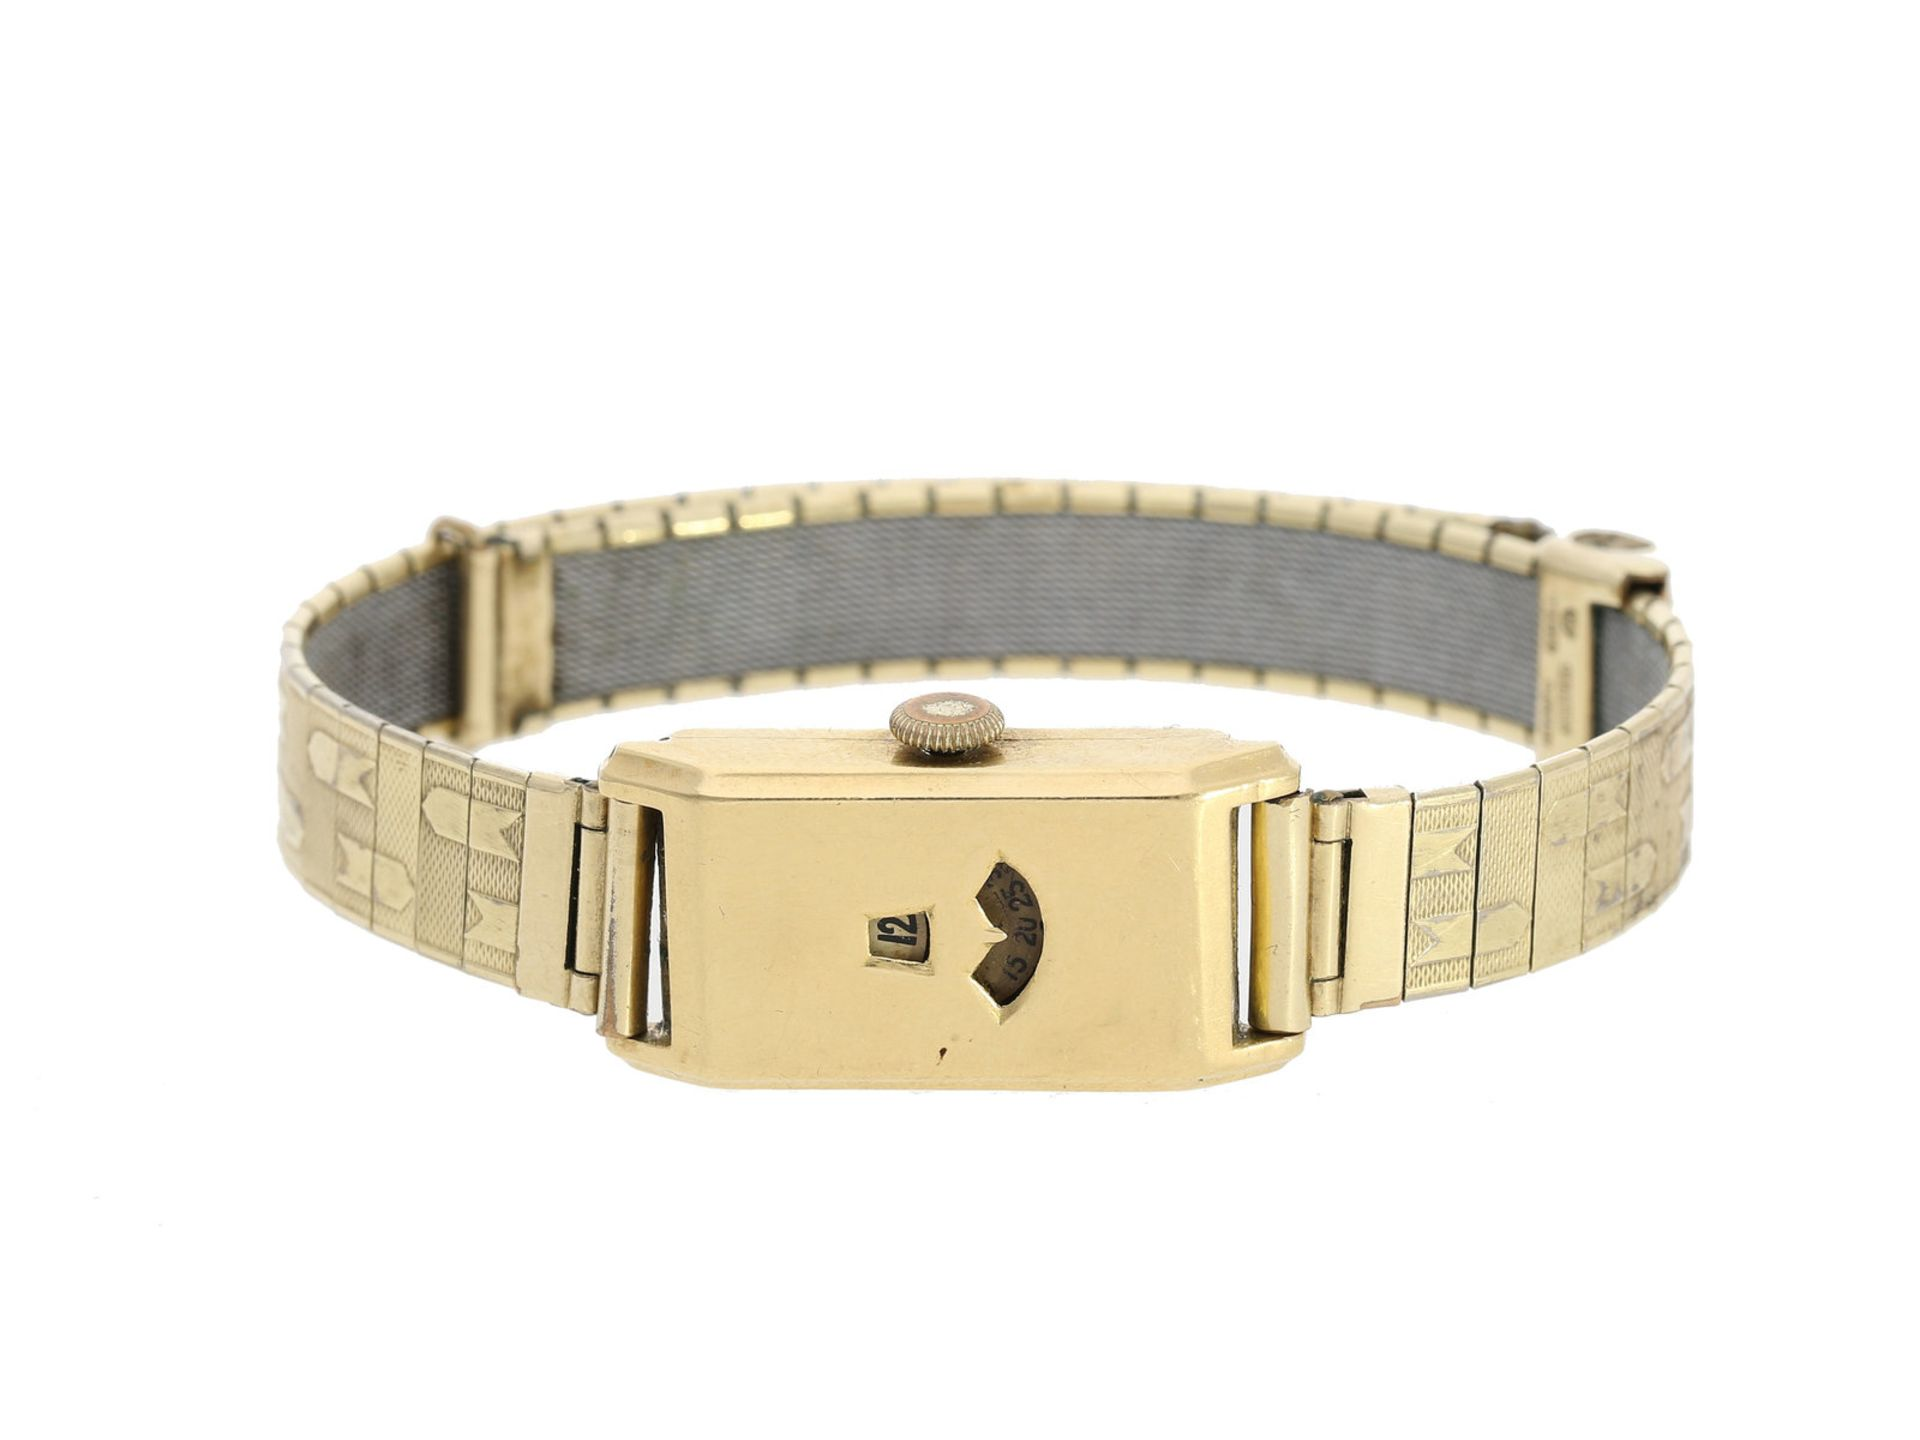 Armbanduhr: seltene, frühe digitale goldene Armbanduhr mit springender Stunde, 30er-Jahre<b